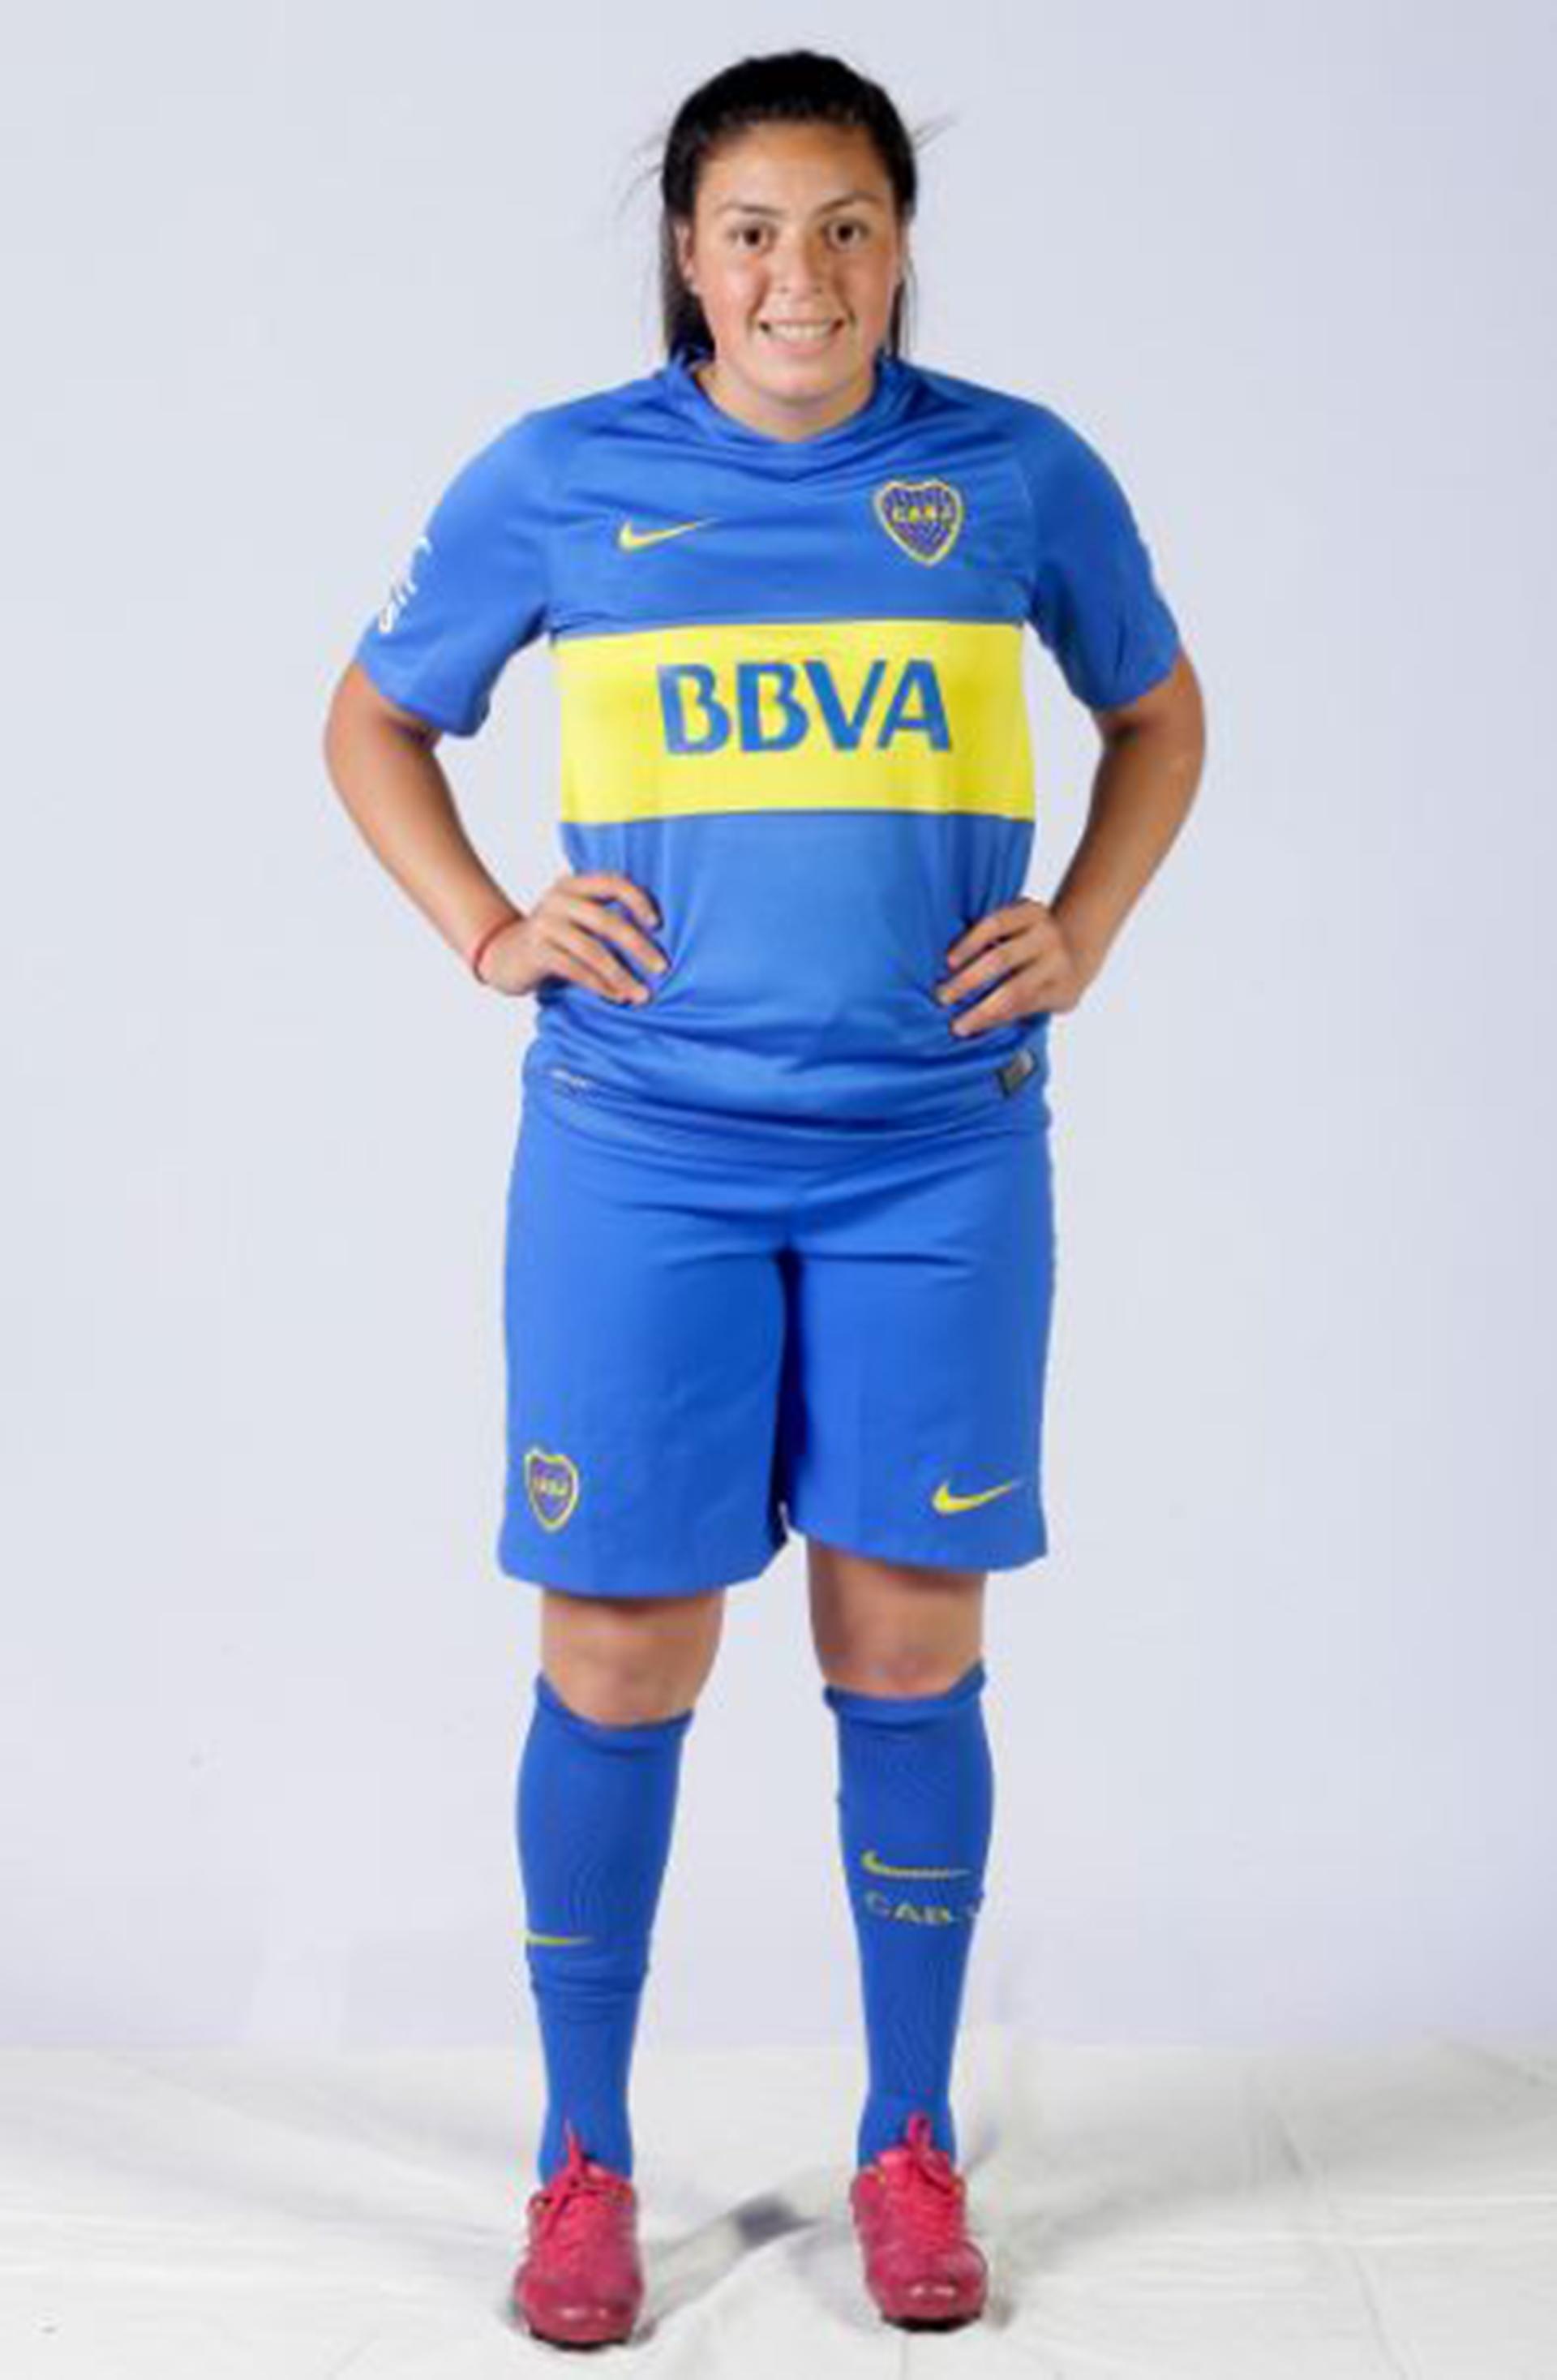 """Play""Piamonte juega fútbol 11 en Boca Juniors (Boca Juniors)"